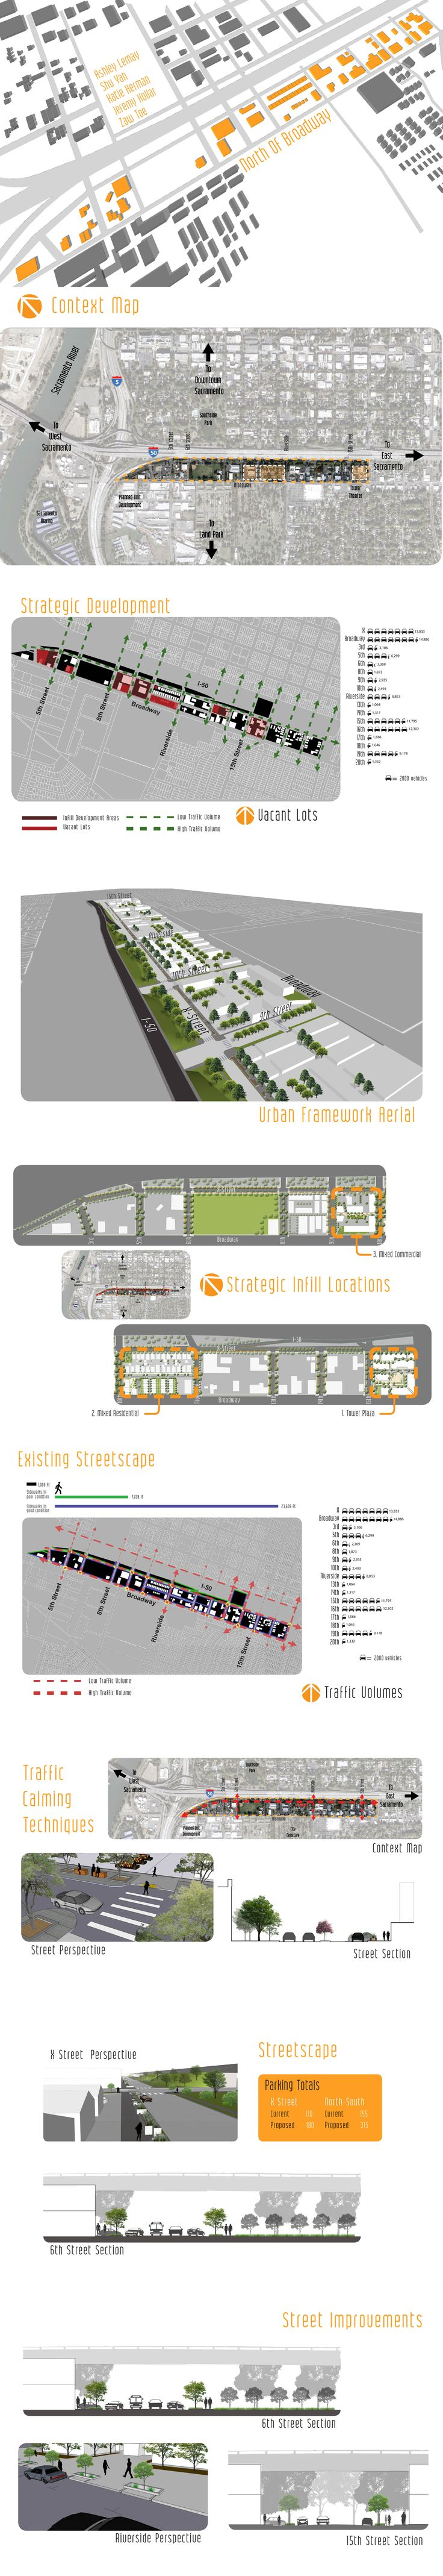 LDA 191 Urban Design - Spring 2013. Broadway Corridor, Sacramento. Powerpoint Presentation p1